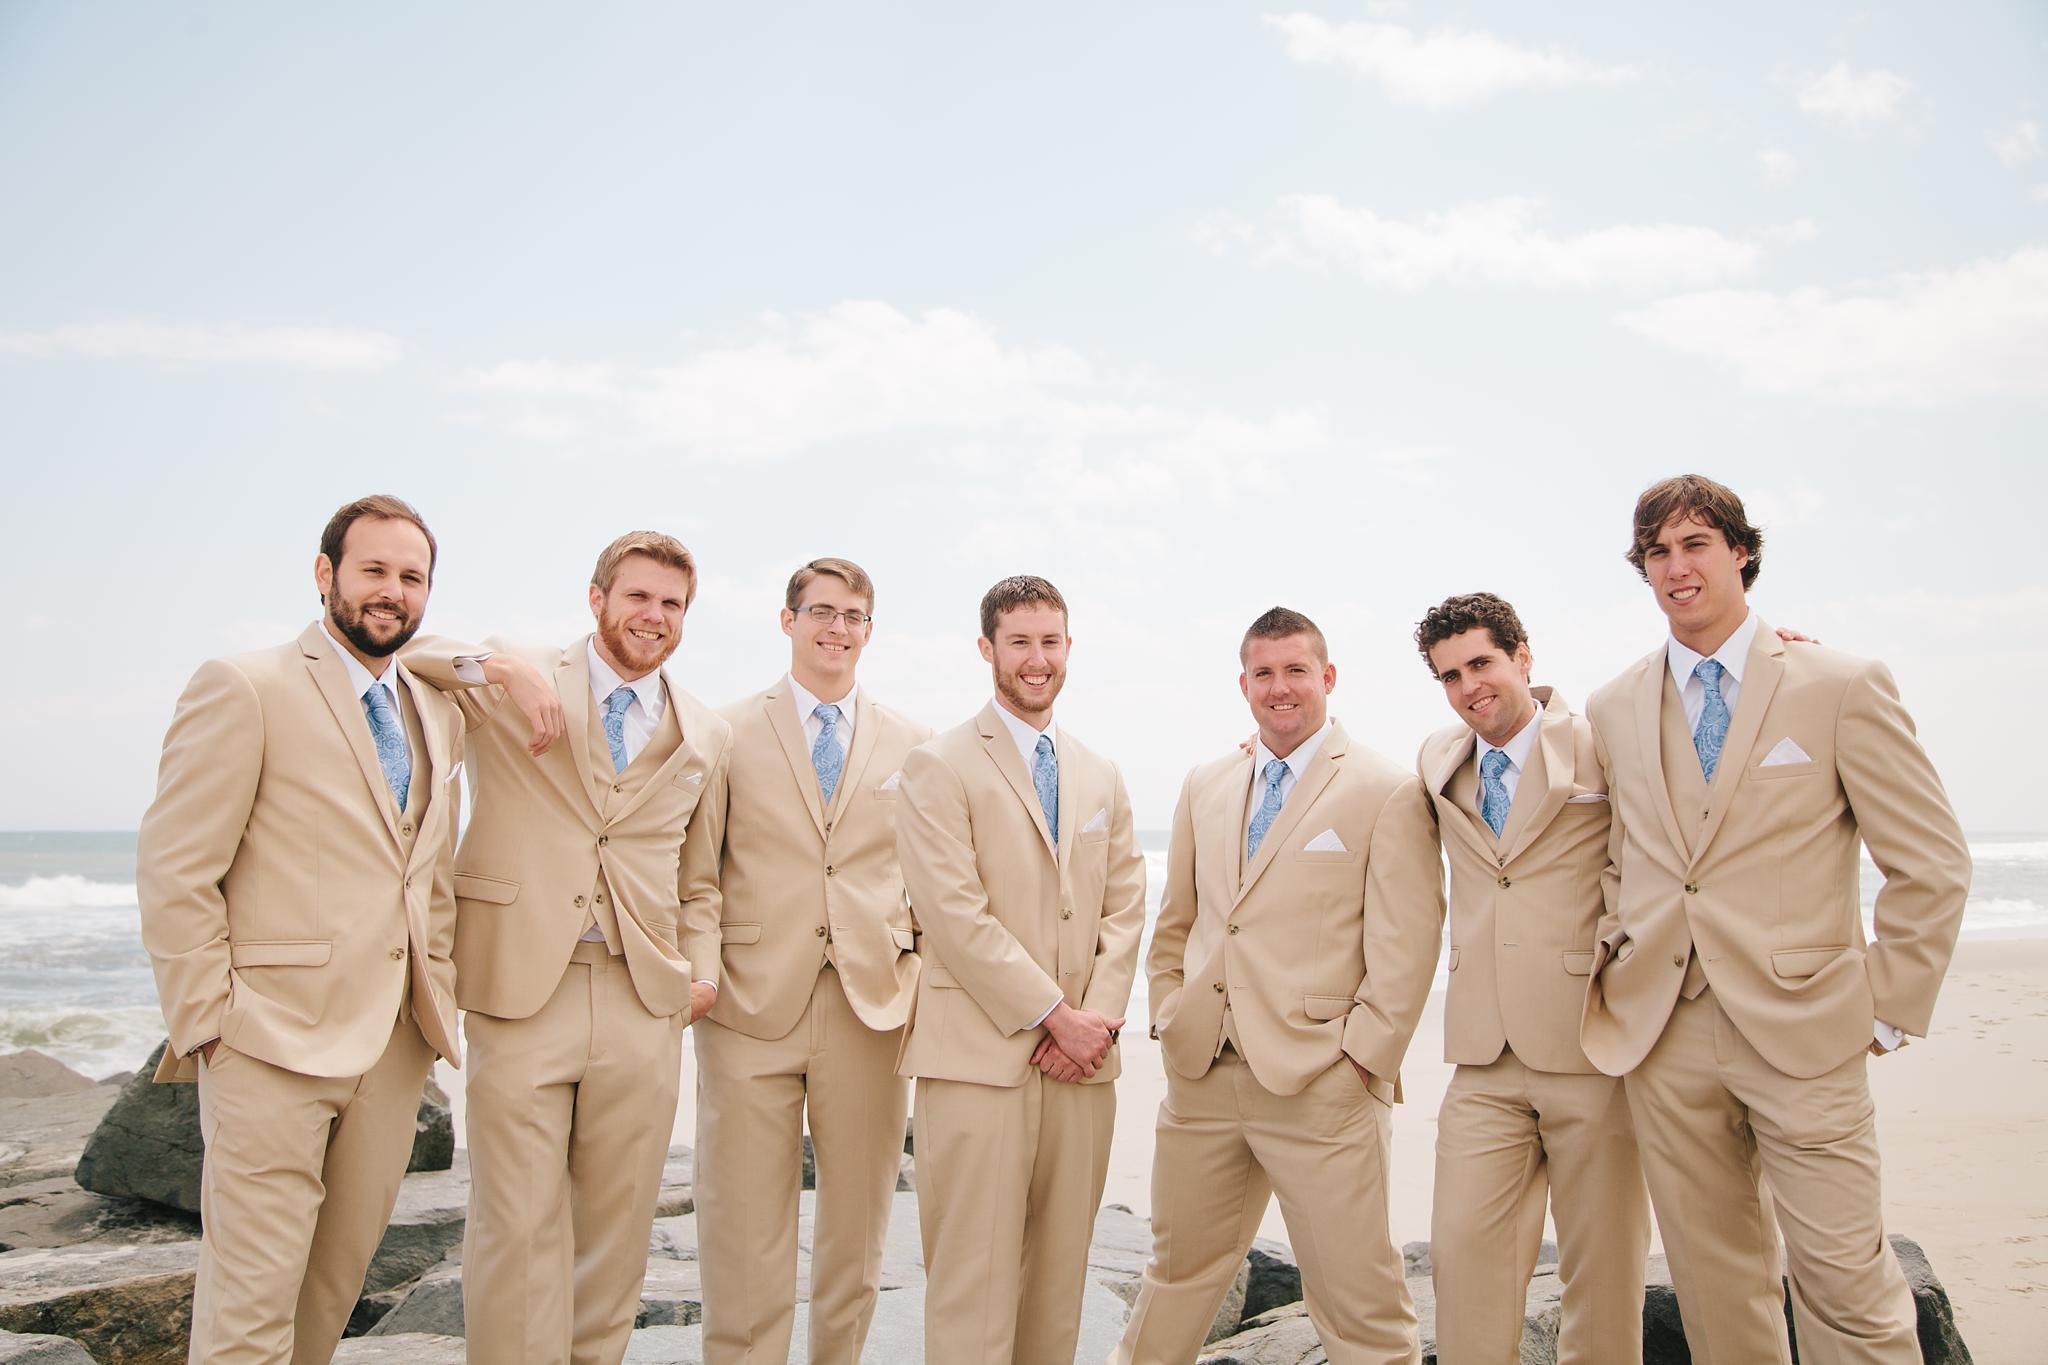 brant_beach_yacht_club_wedding_long_beach_island_nj_wedding_photographer_156.jpg